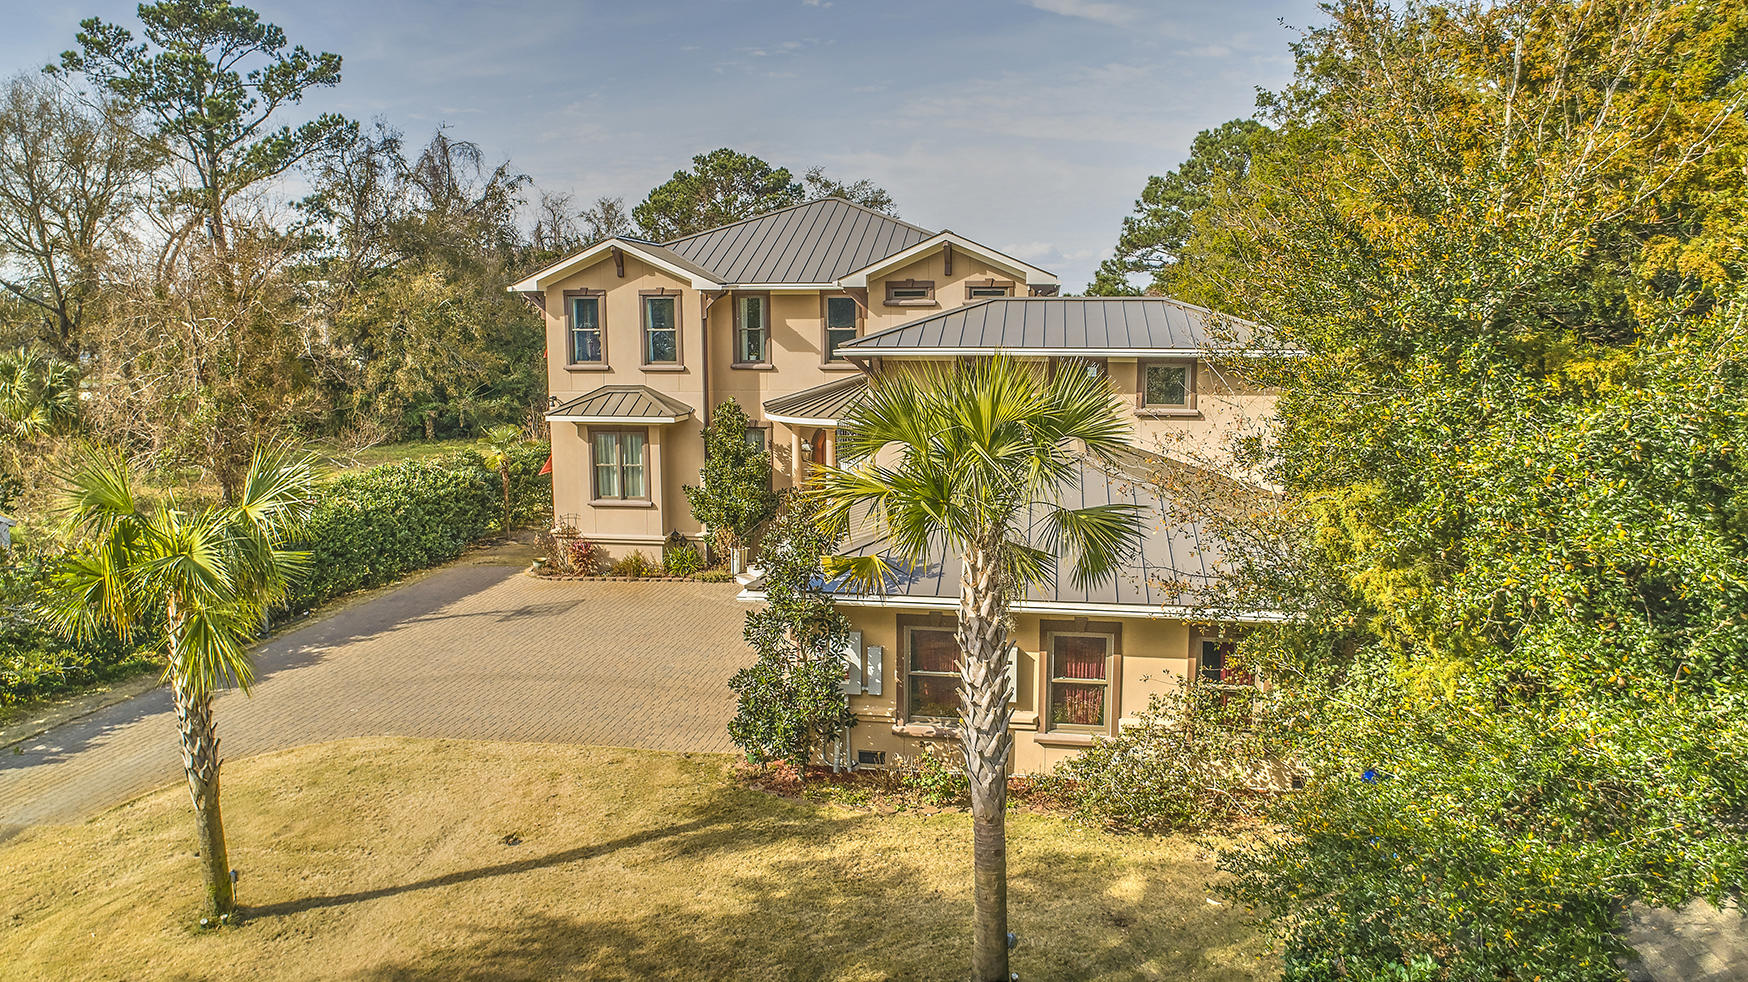 Wappoo Hall Homes For Sale - 2044 Wappoo Hall, Charleston, SC - 2